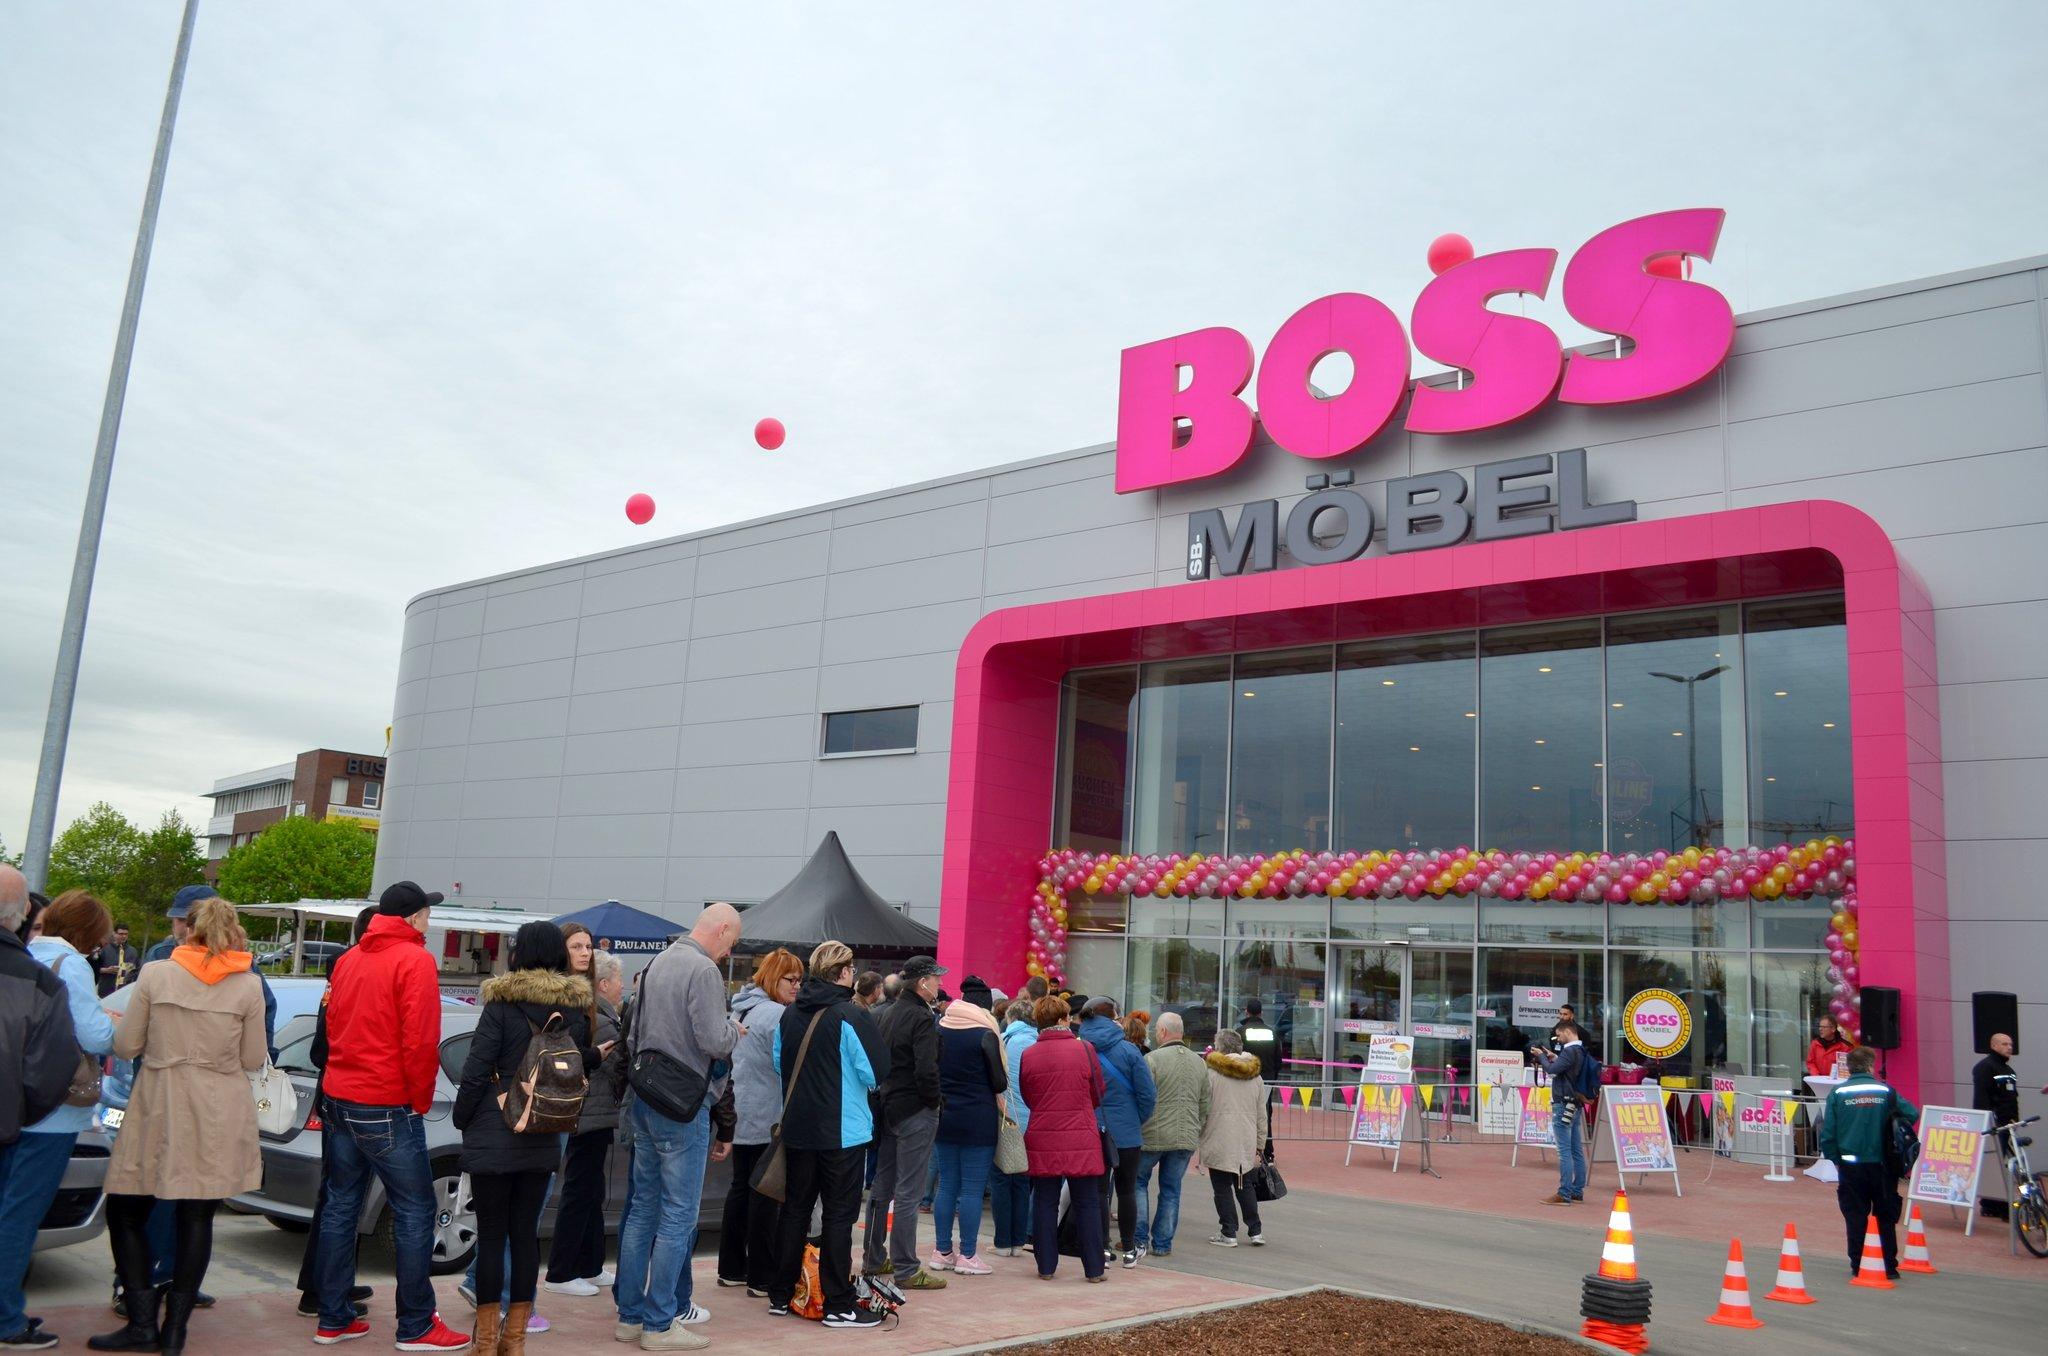 Mobeldiscounter Sb Mobel Boss Eroffnete Am 8 Mai In Mahlsdorf